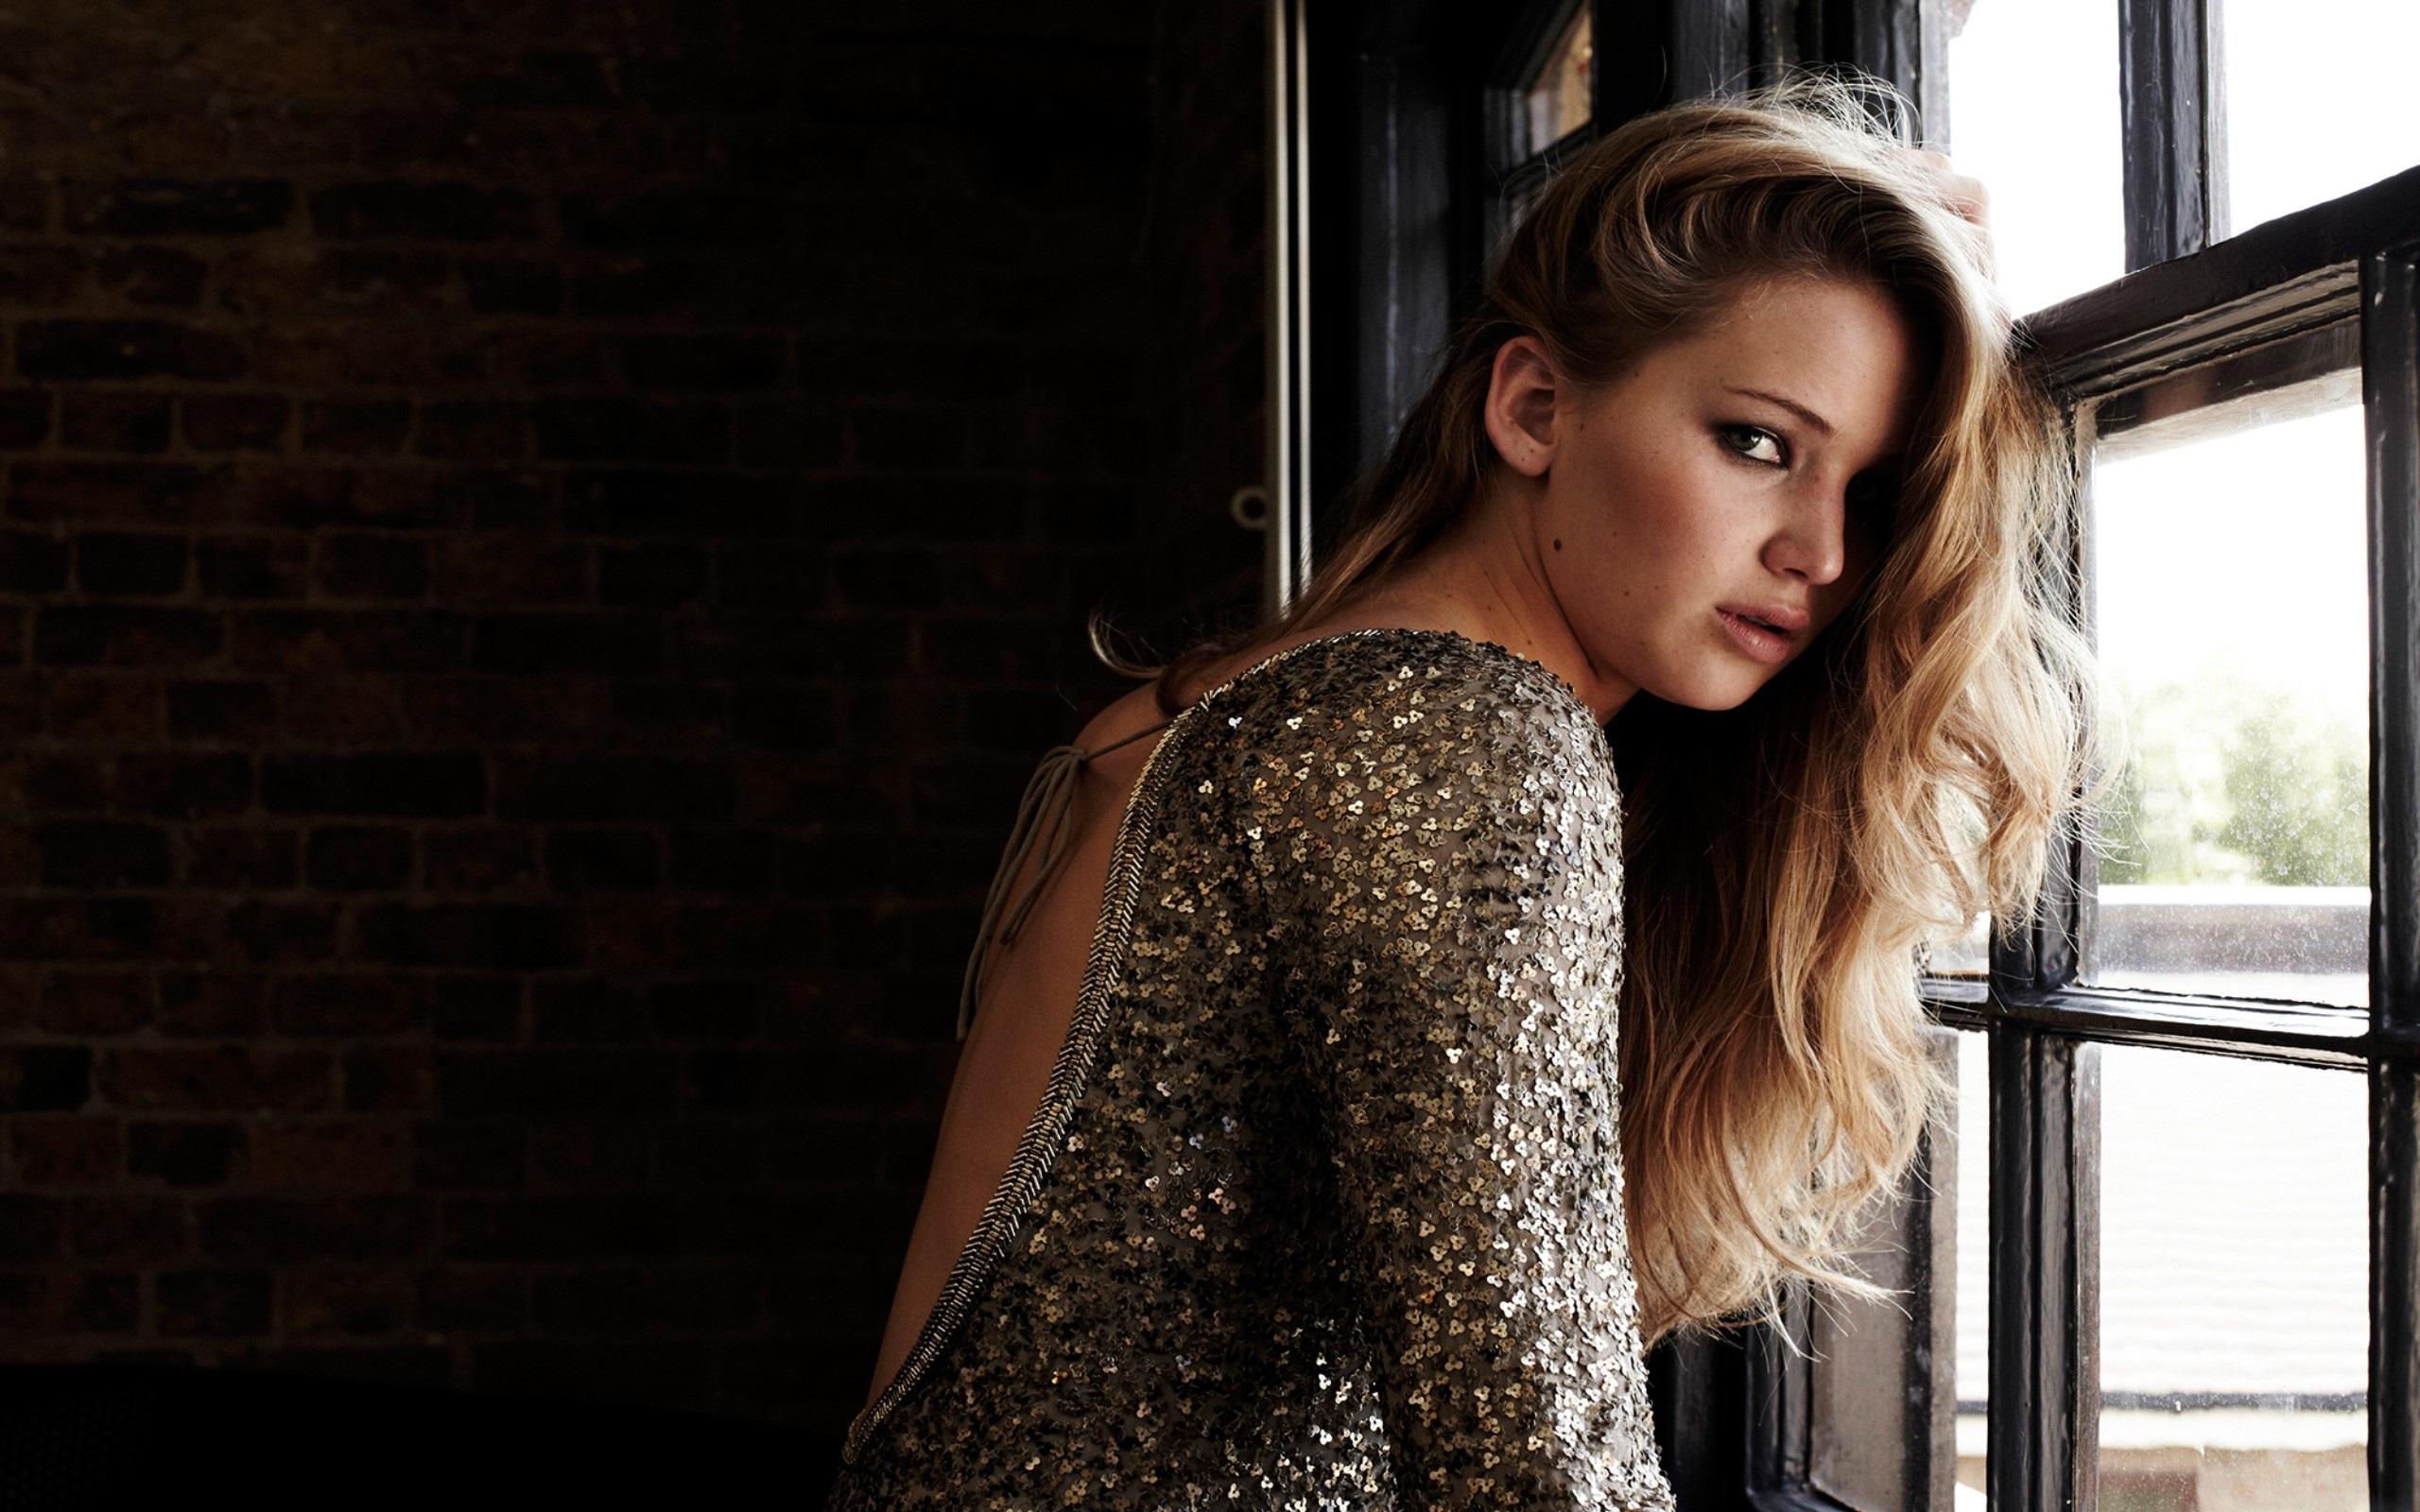 Jennifer Lawrence nice poss images